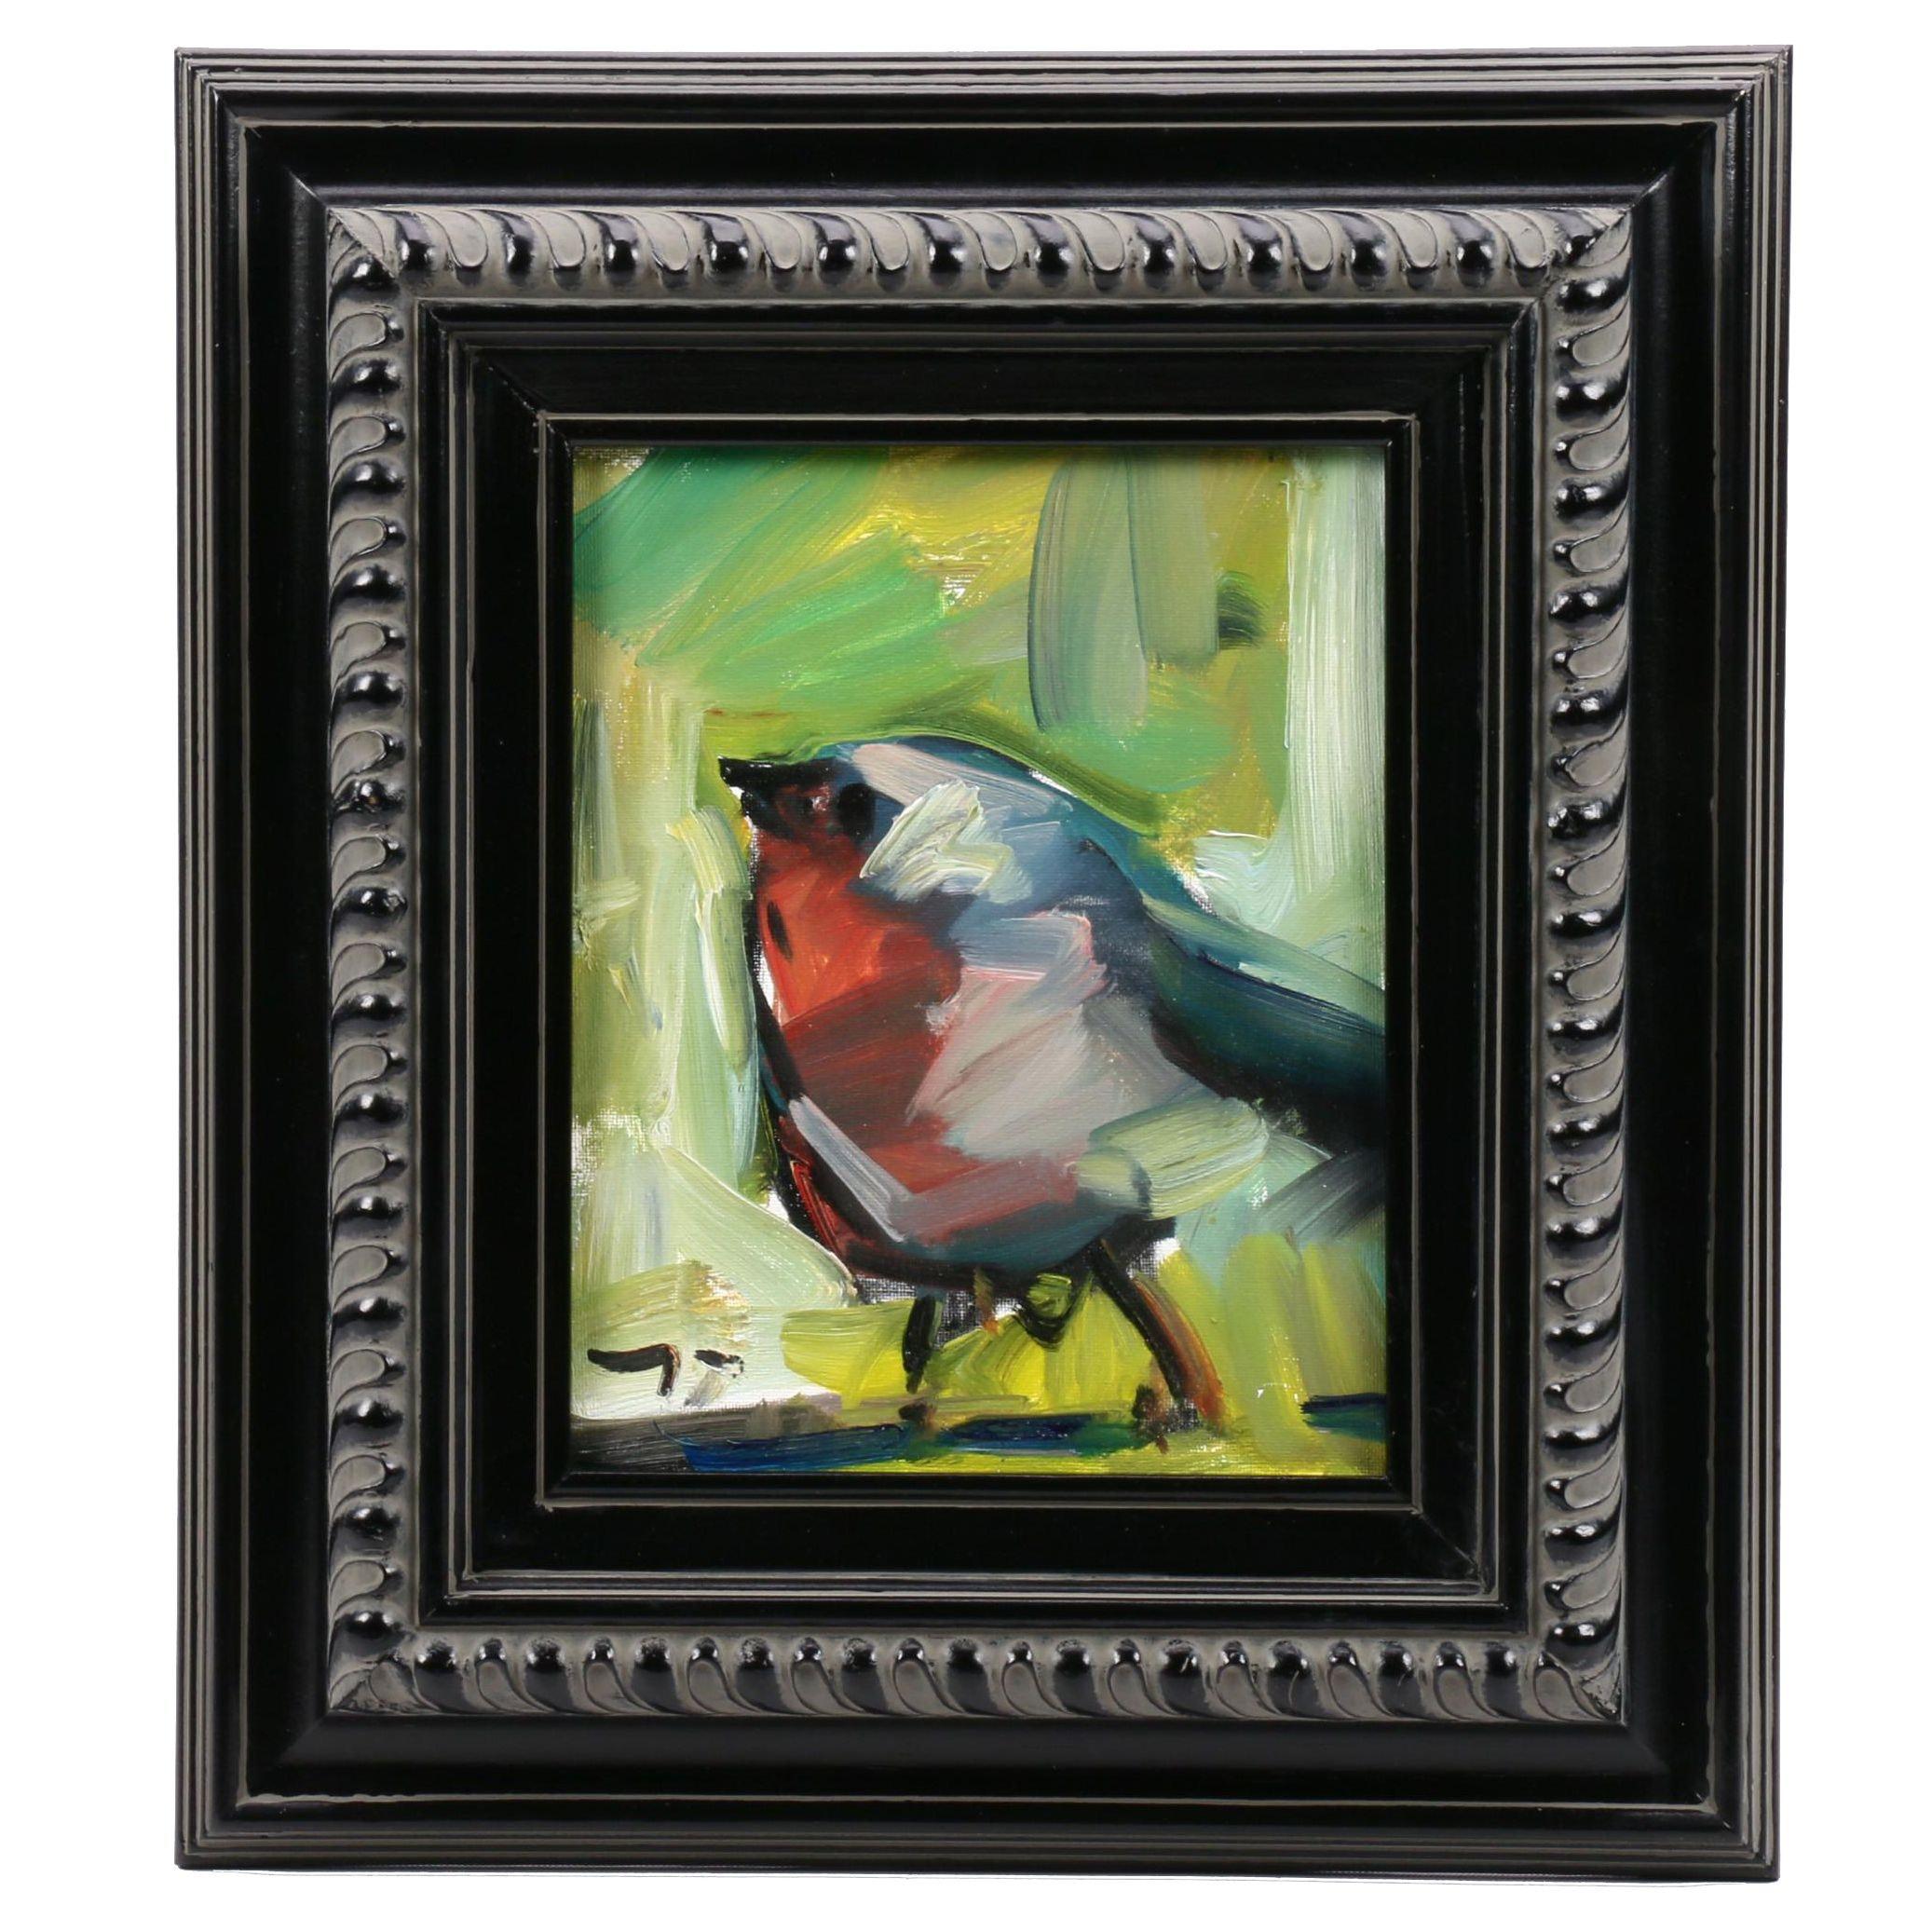 Jose Trujillo Oil Painting of a Bird